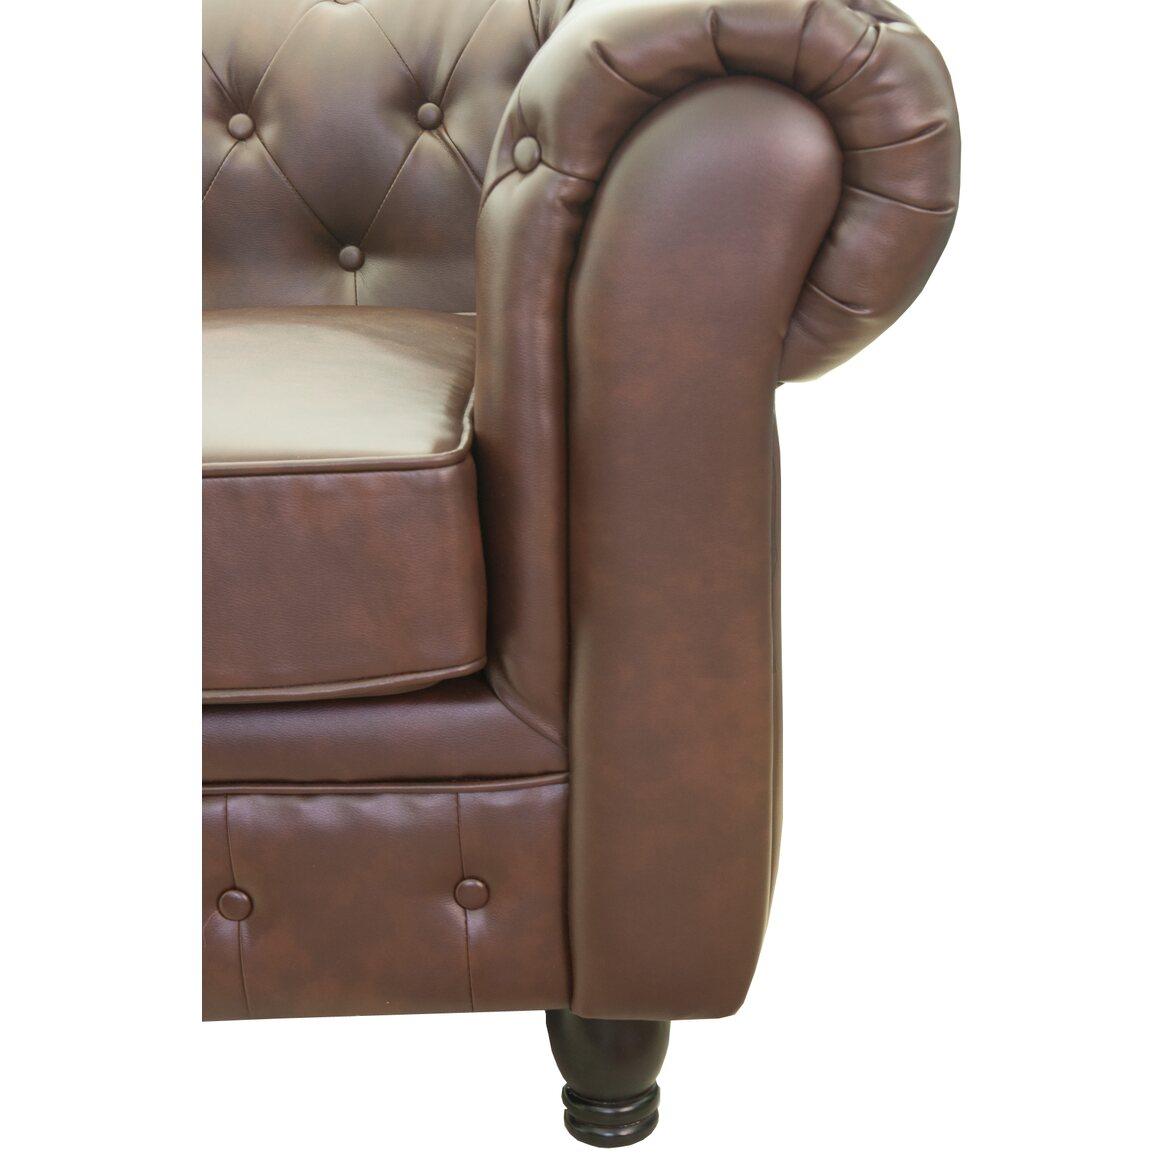 Кожаный диван двухместный Chesterfield brown 2S 3   Прямые диваны Kingsby